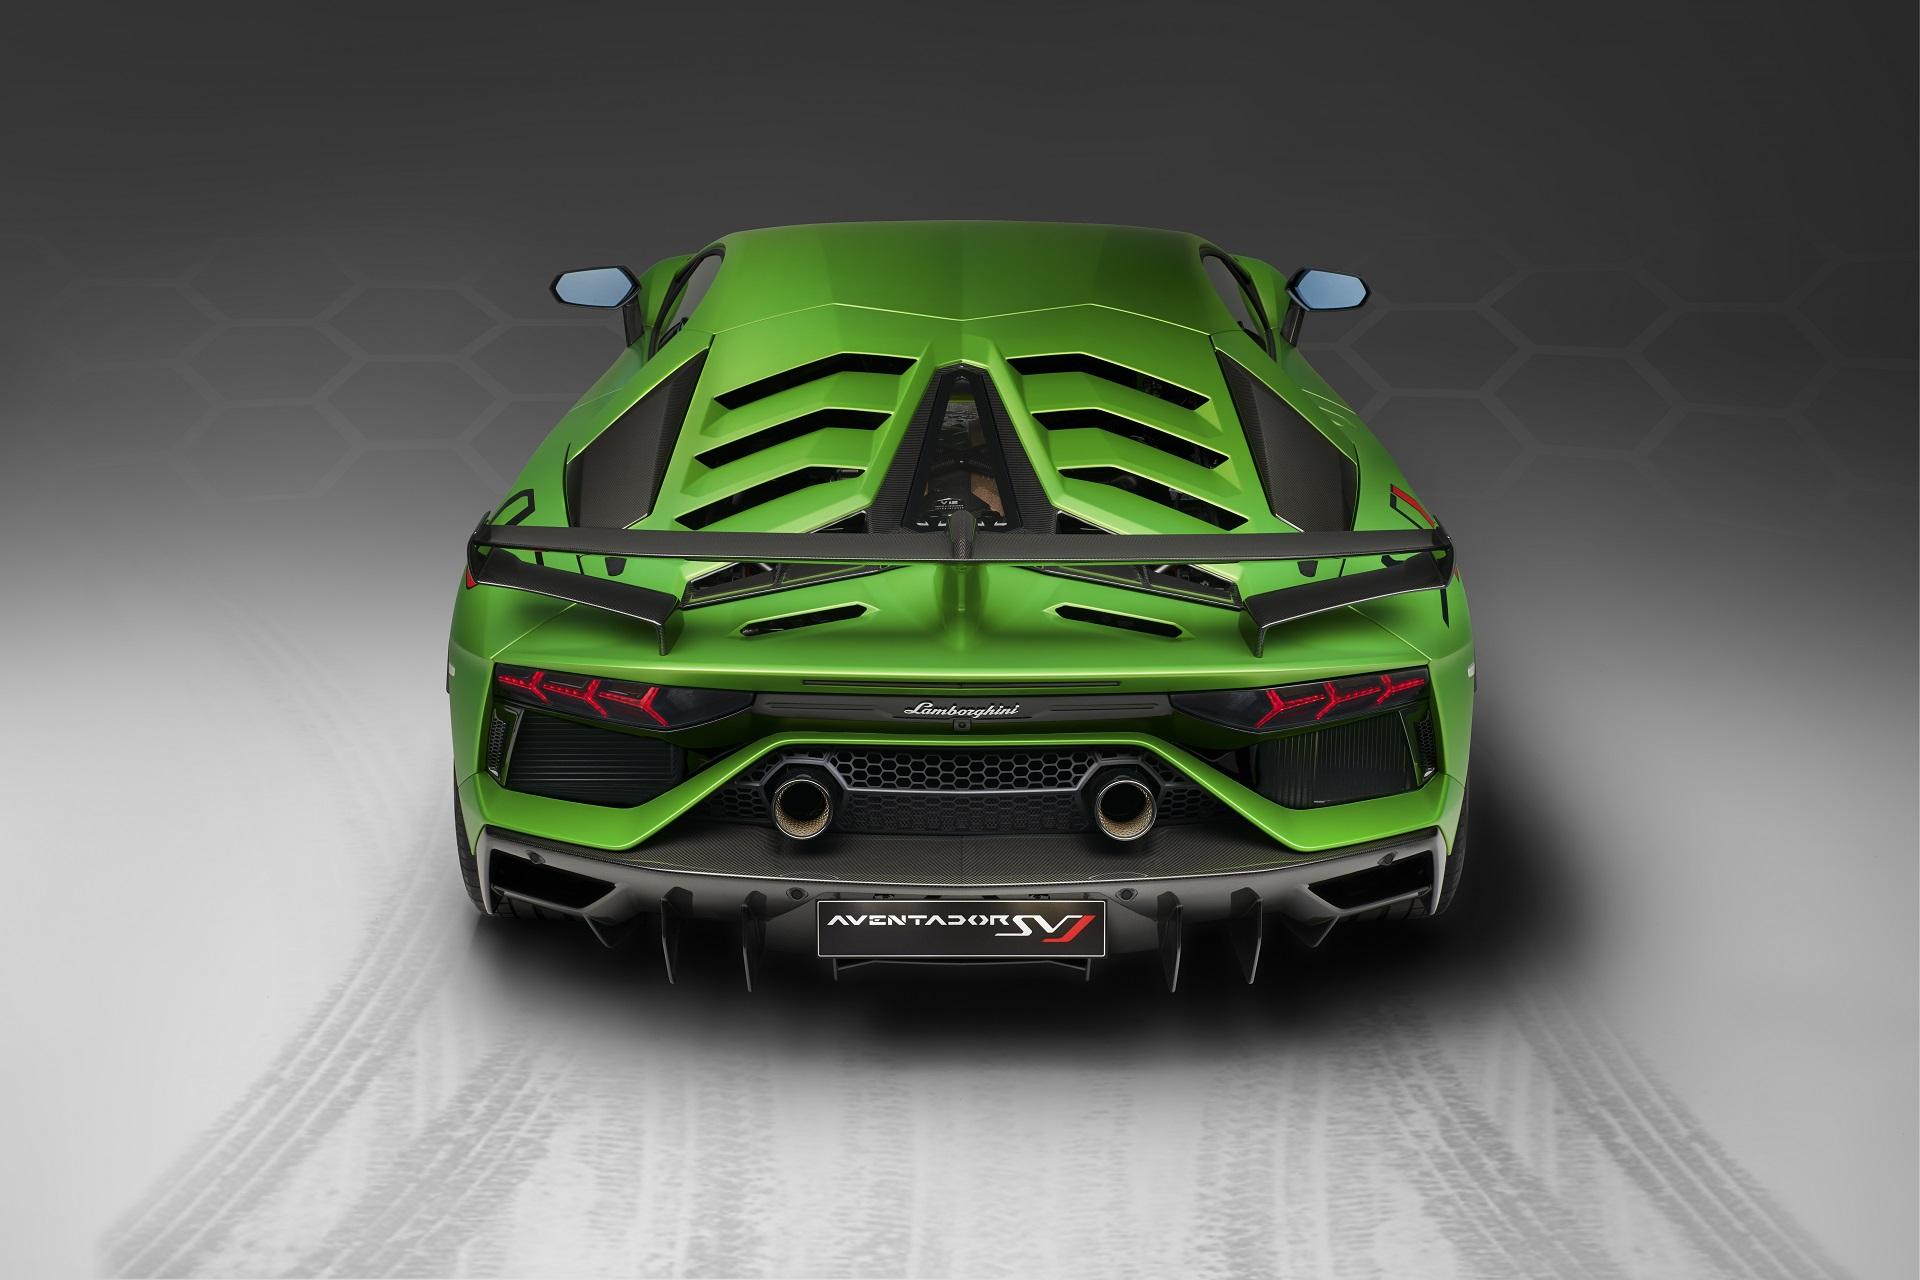 2019 Lamborghini Aventador Svj Performante Style Aero Meets 770 Hp